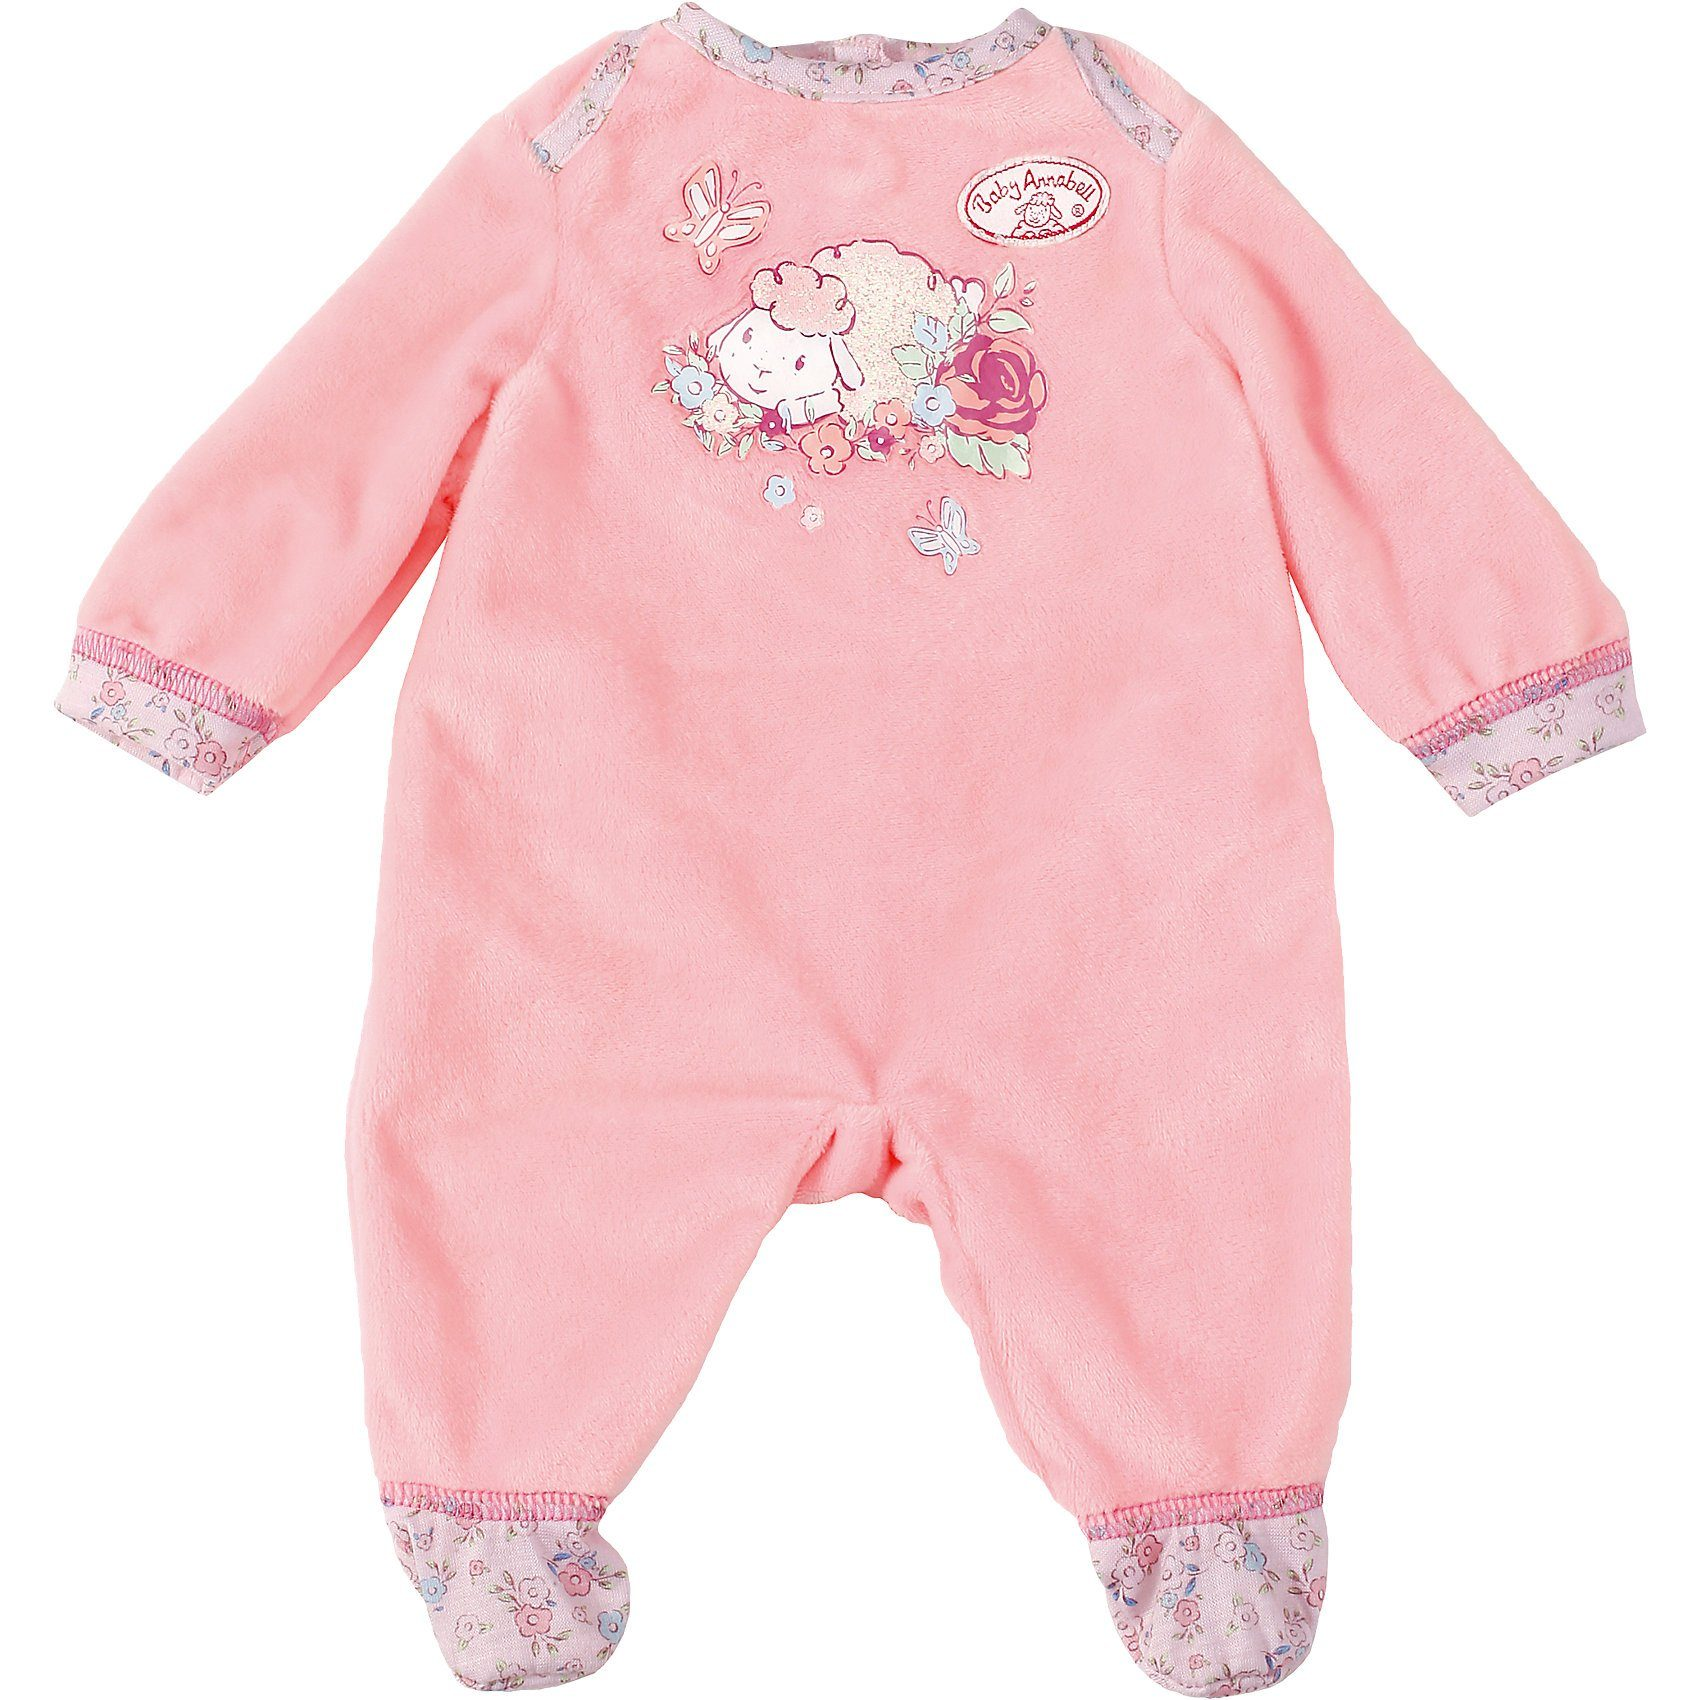 Zapf Creation Baby Annabell® Puppenkleidung Strampler, 46 cm, sortiert